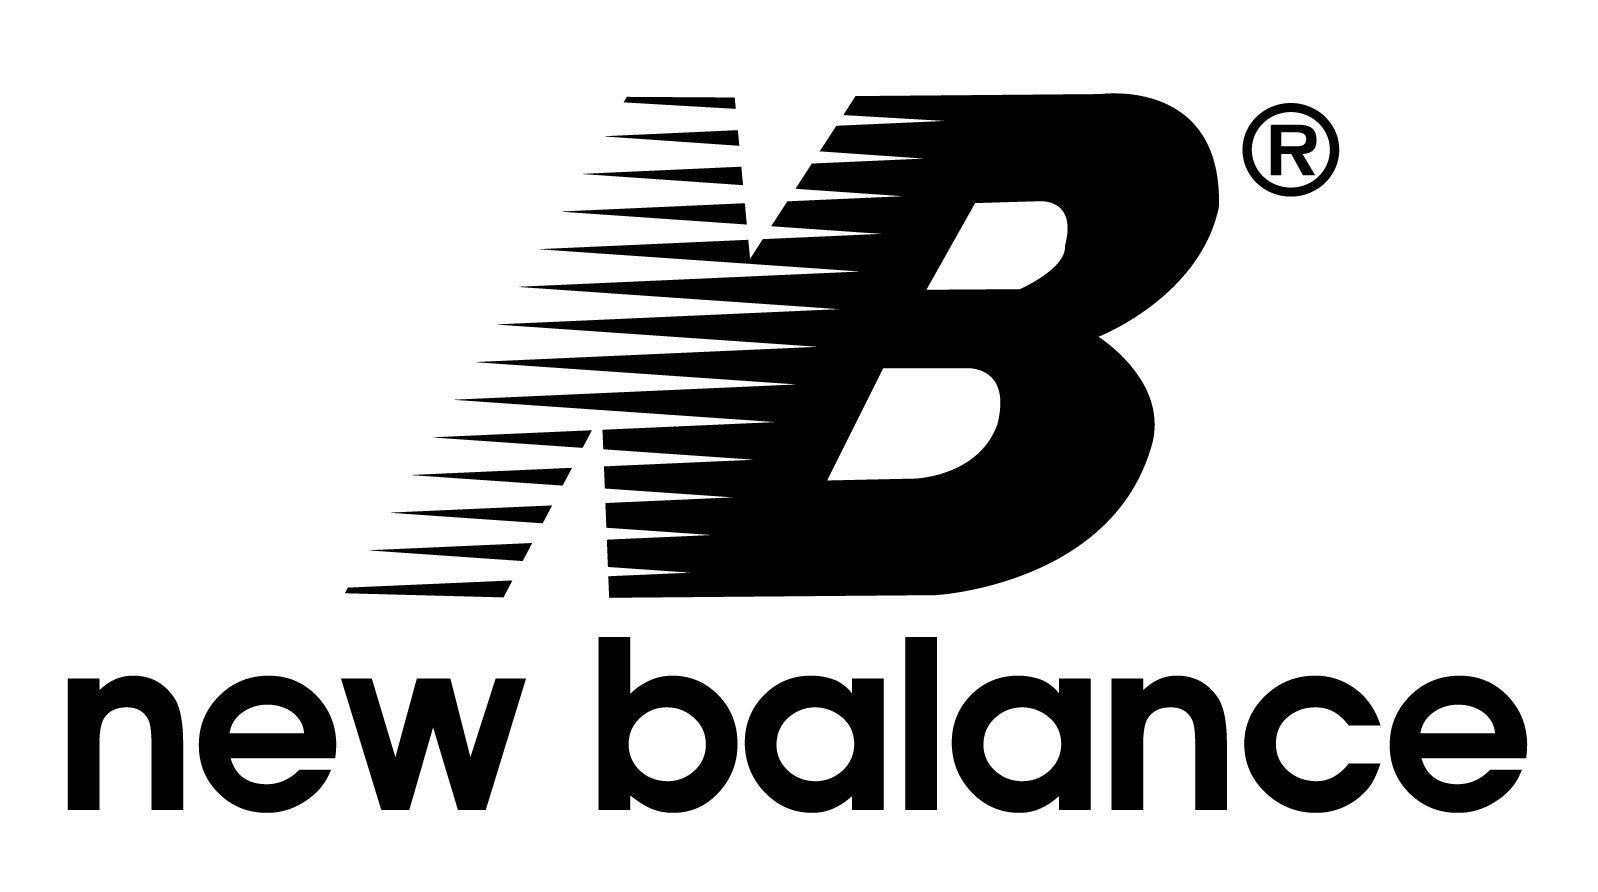 BalanceMarque LogoNew LogoNew BalanceMarque LogoNew BalanceMarque BalanceMarque LogoNew BalanceMarque LogoNew BalanceMarque LogoNew BalanceMarque LogoNew LogoNew BalanceMarque LogoNew 76fgbYy